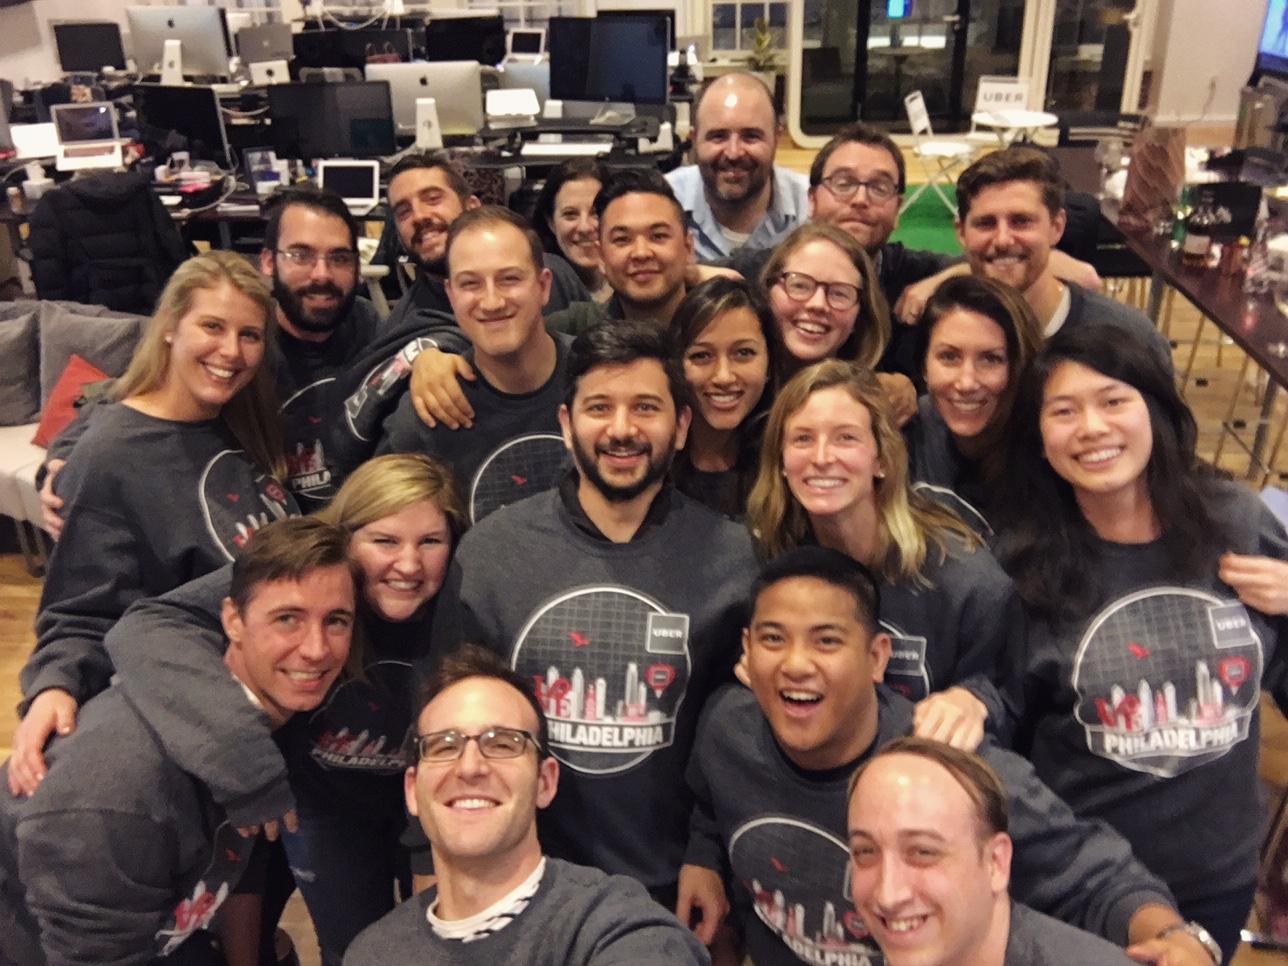 Shirt design uber - Uber Crewnecks T Shirt Photo